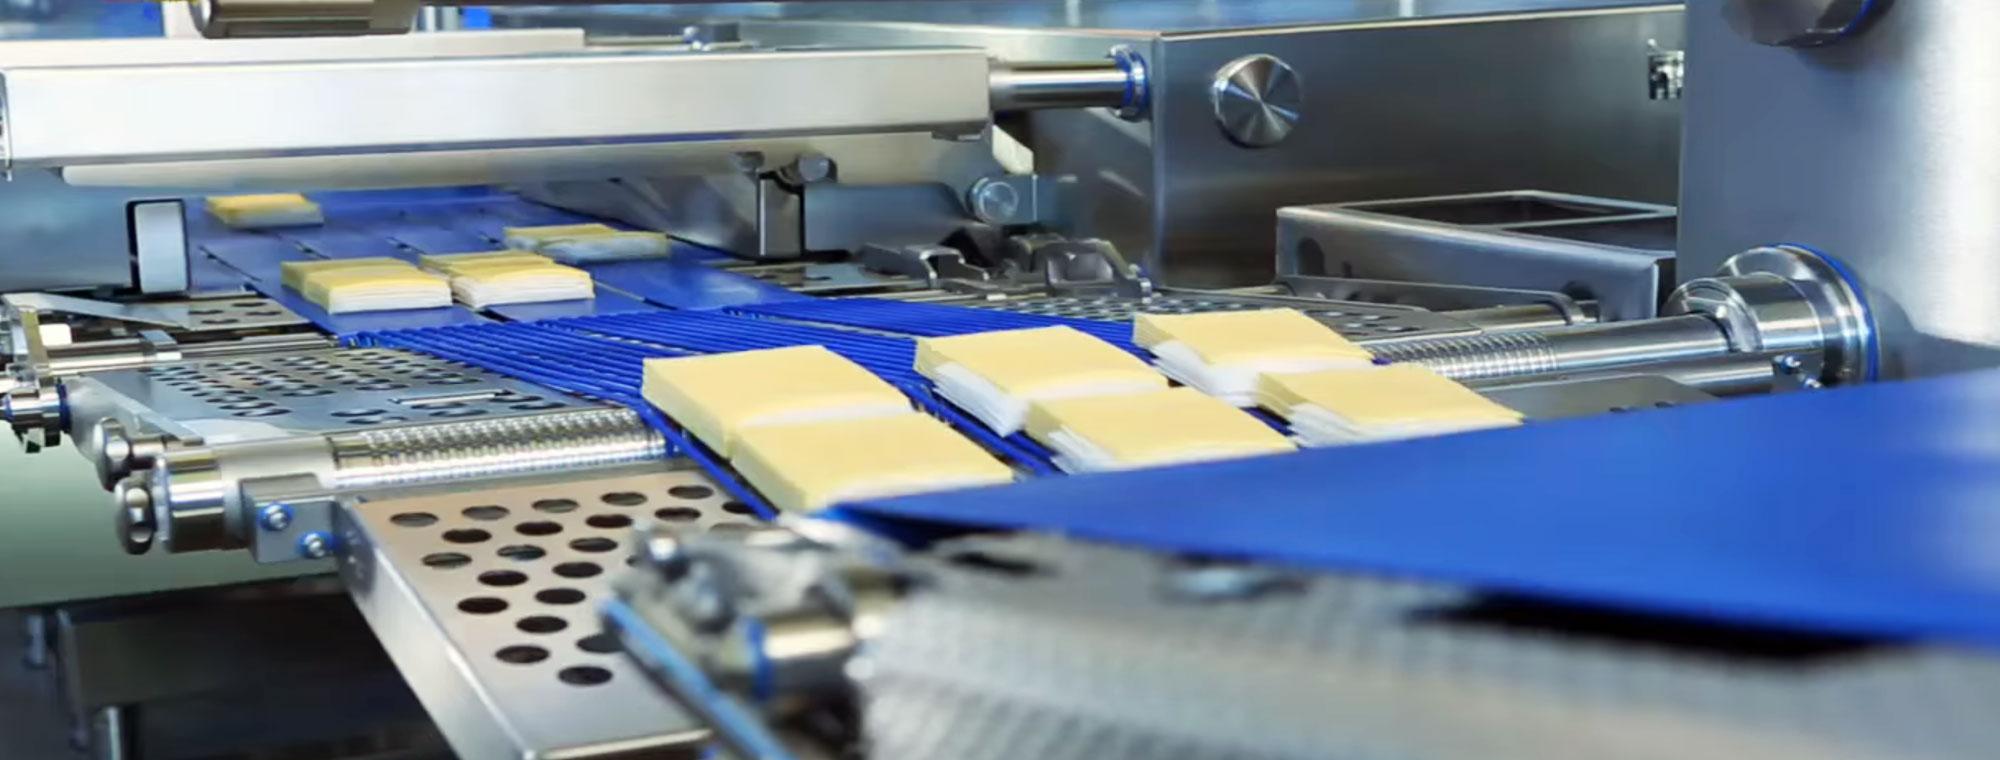 queso maquina interleaving